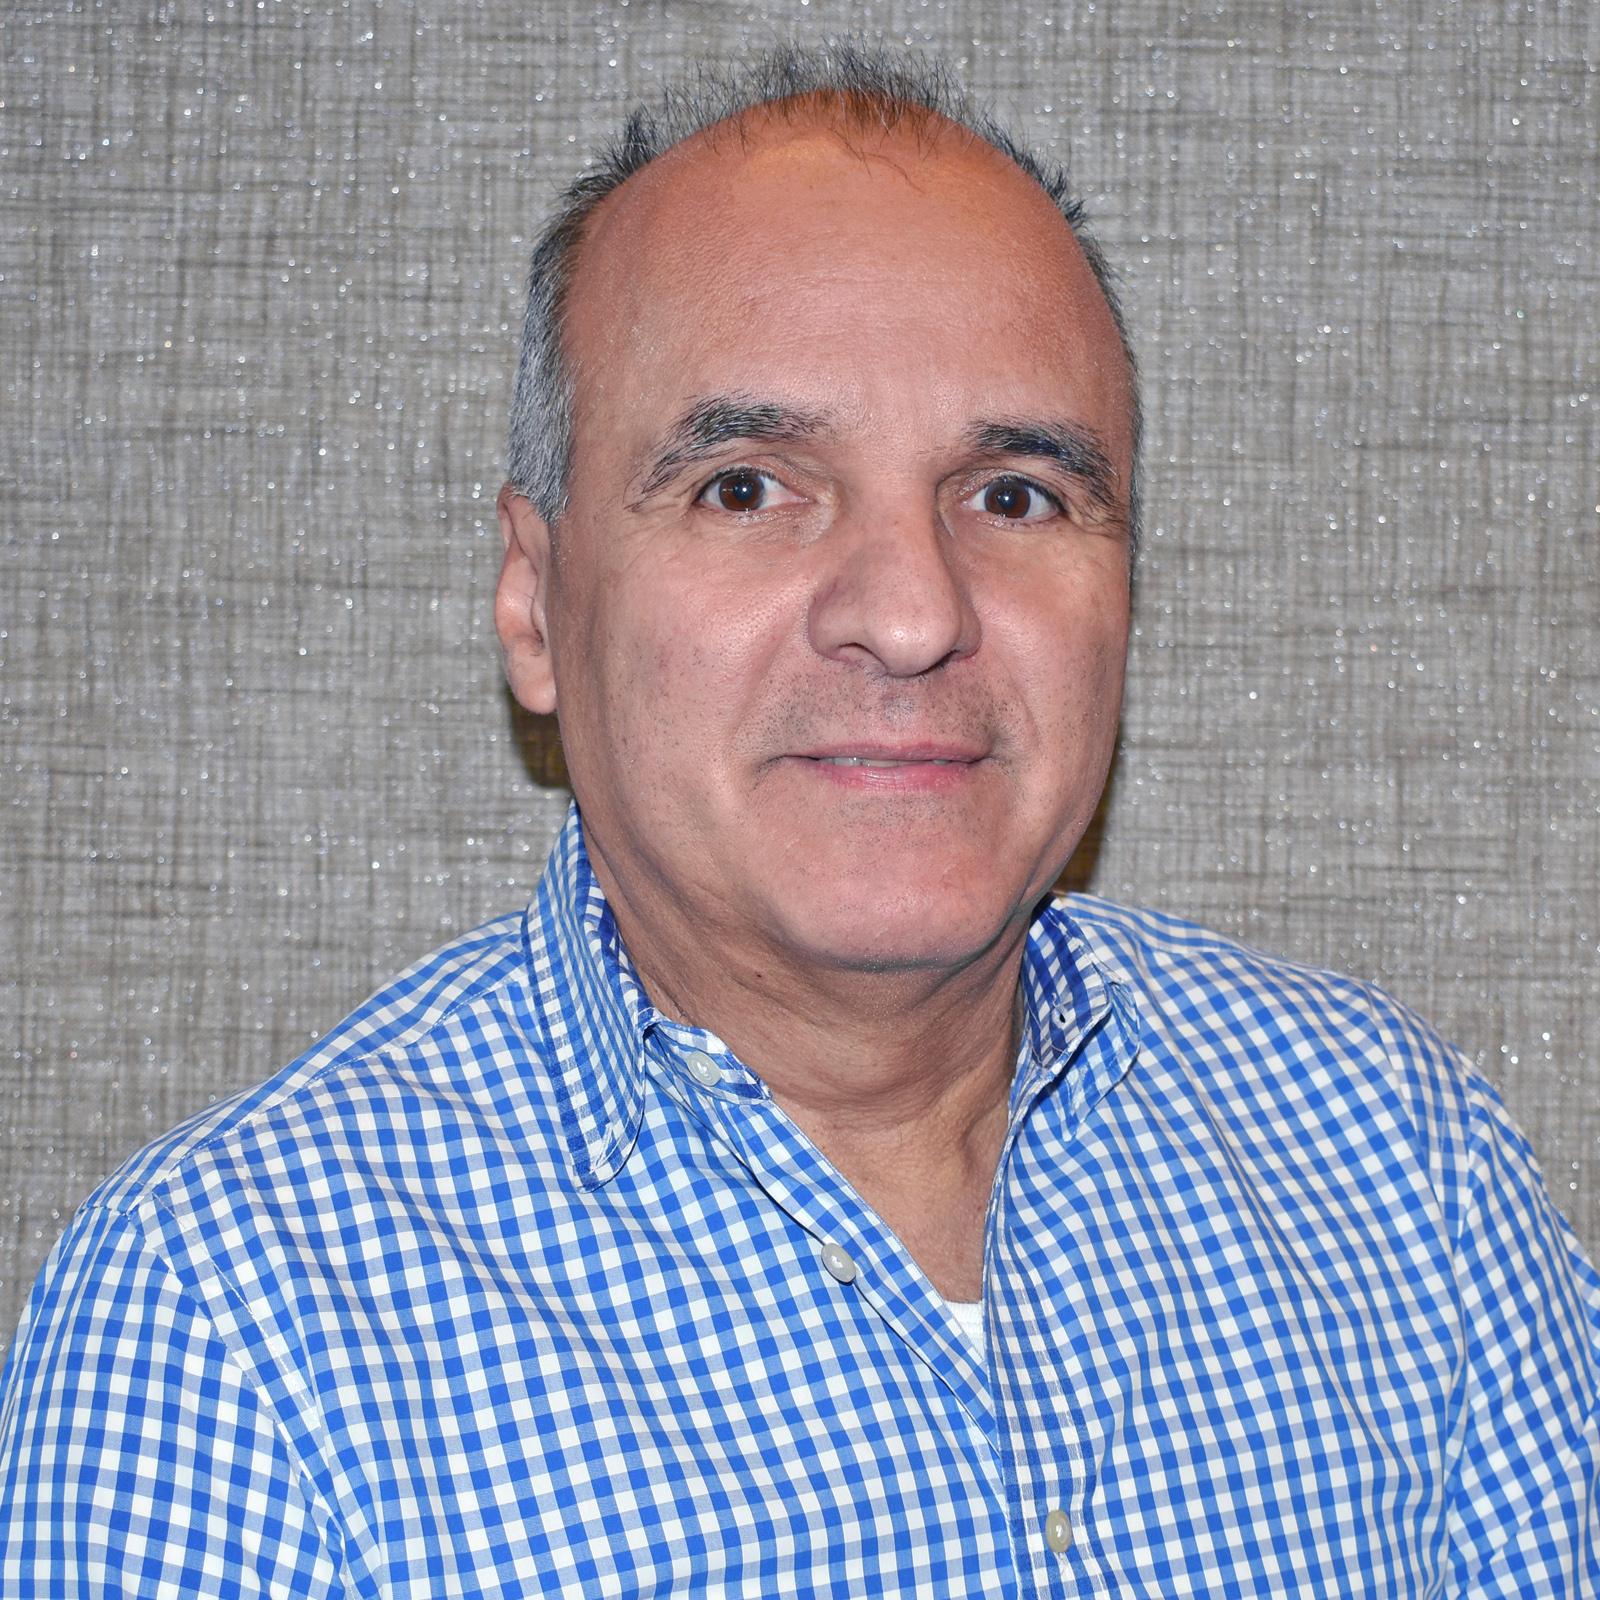 Carlos Garcia Rada